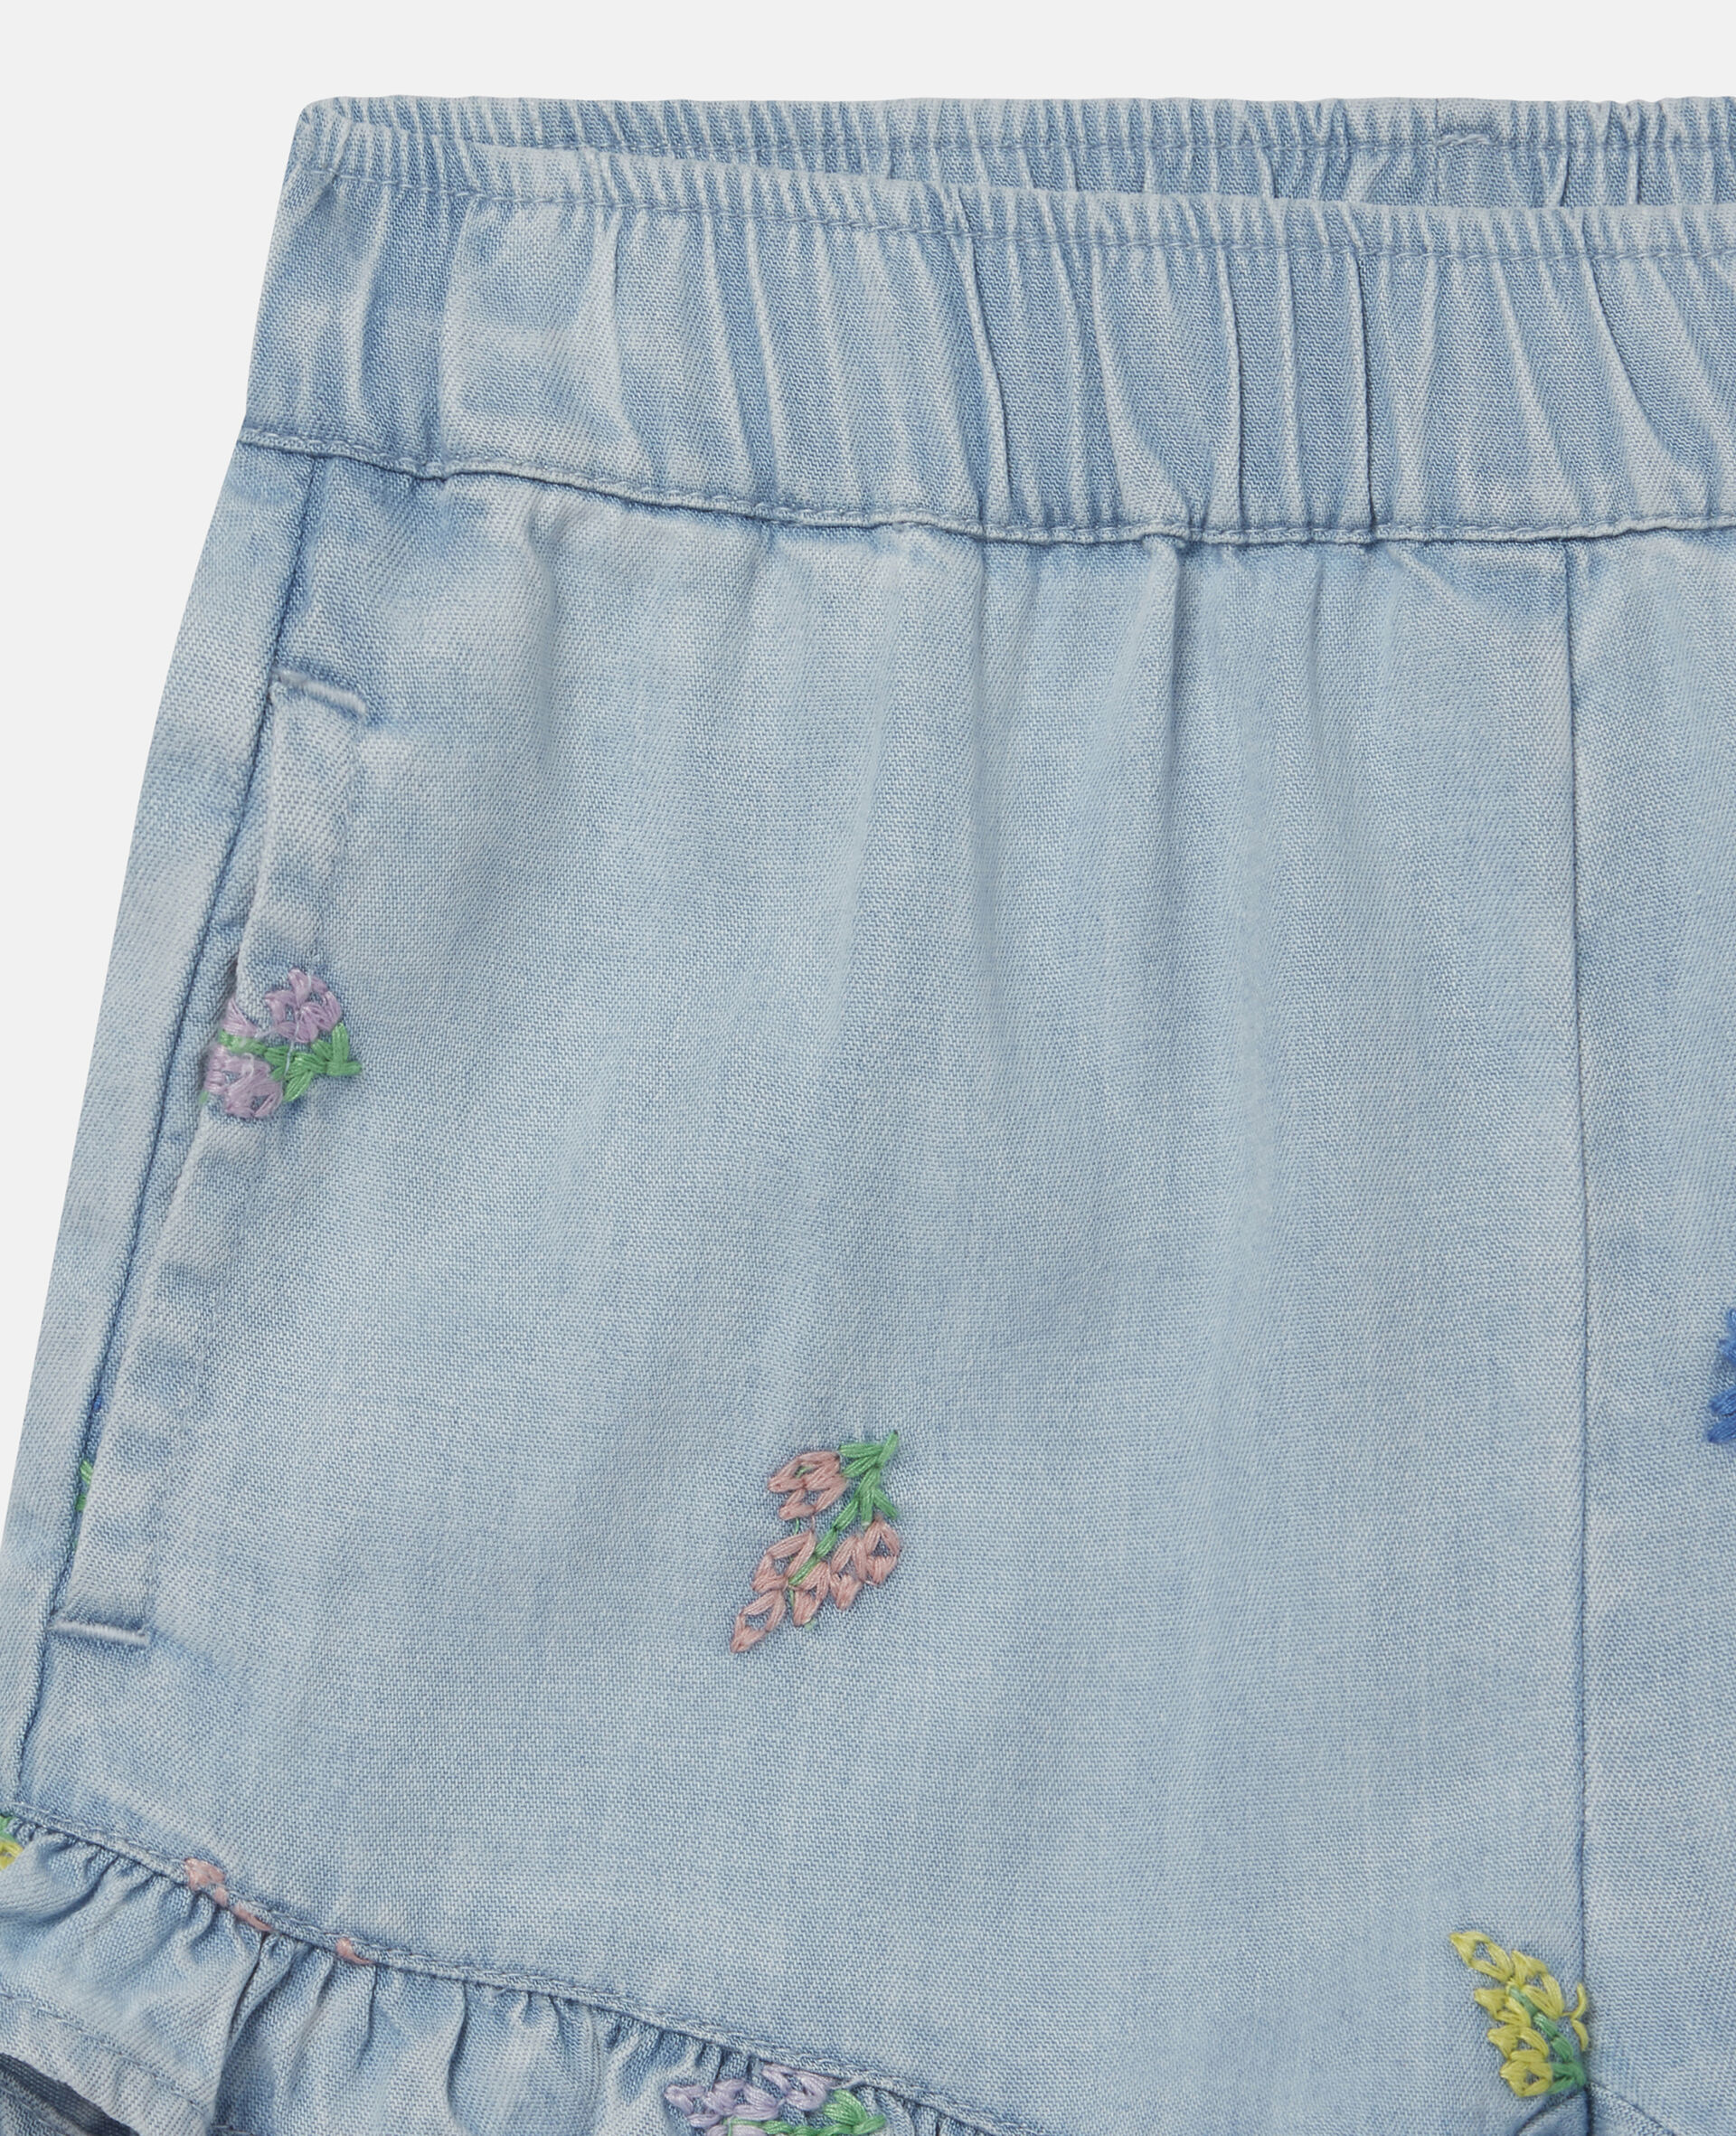 Embroidered Flowers Denim Shorts-Blue-large image number 1